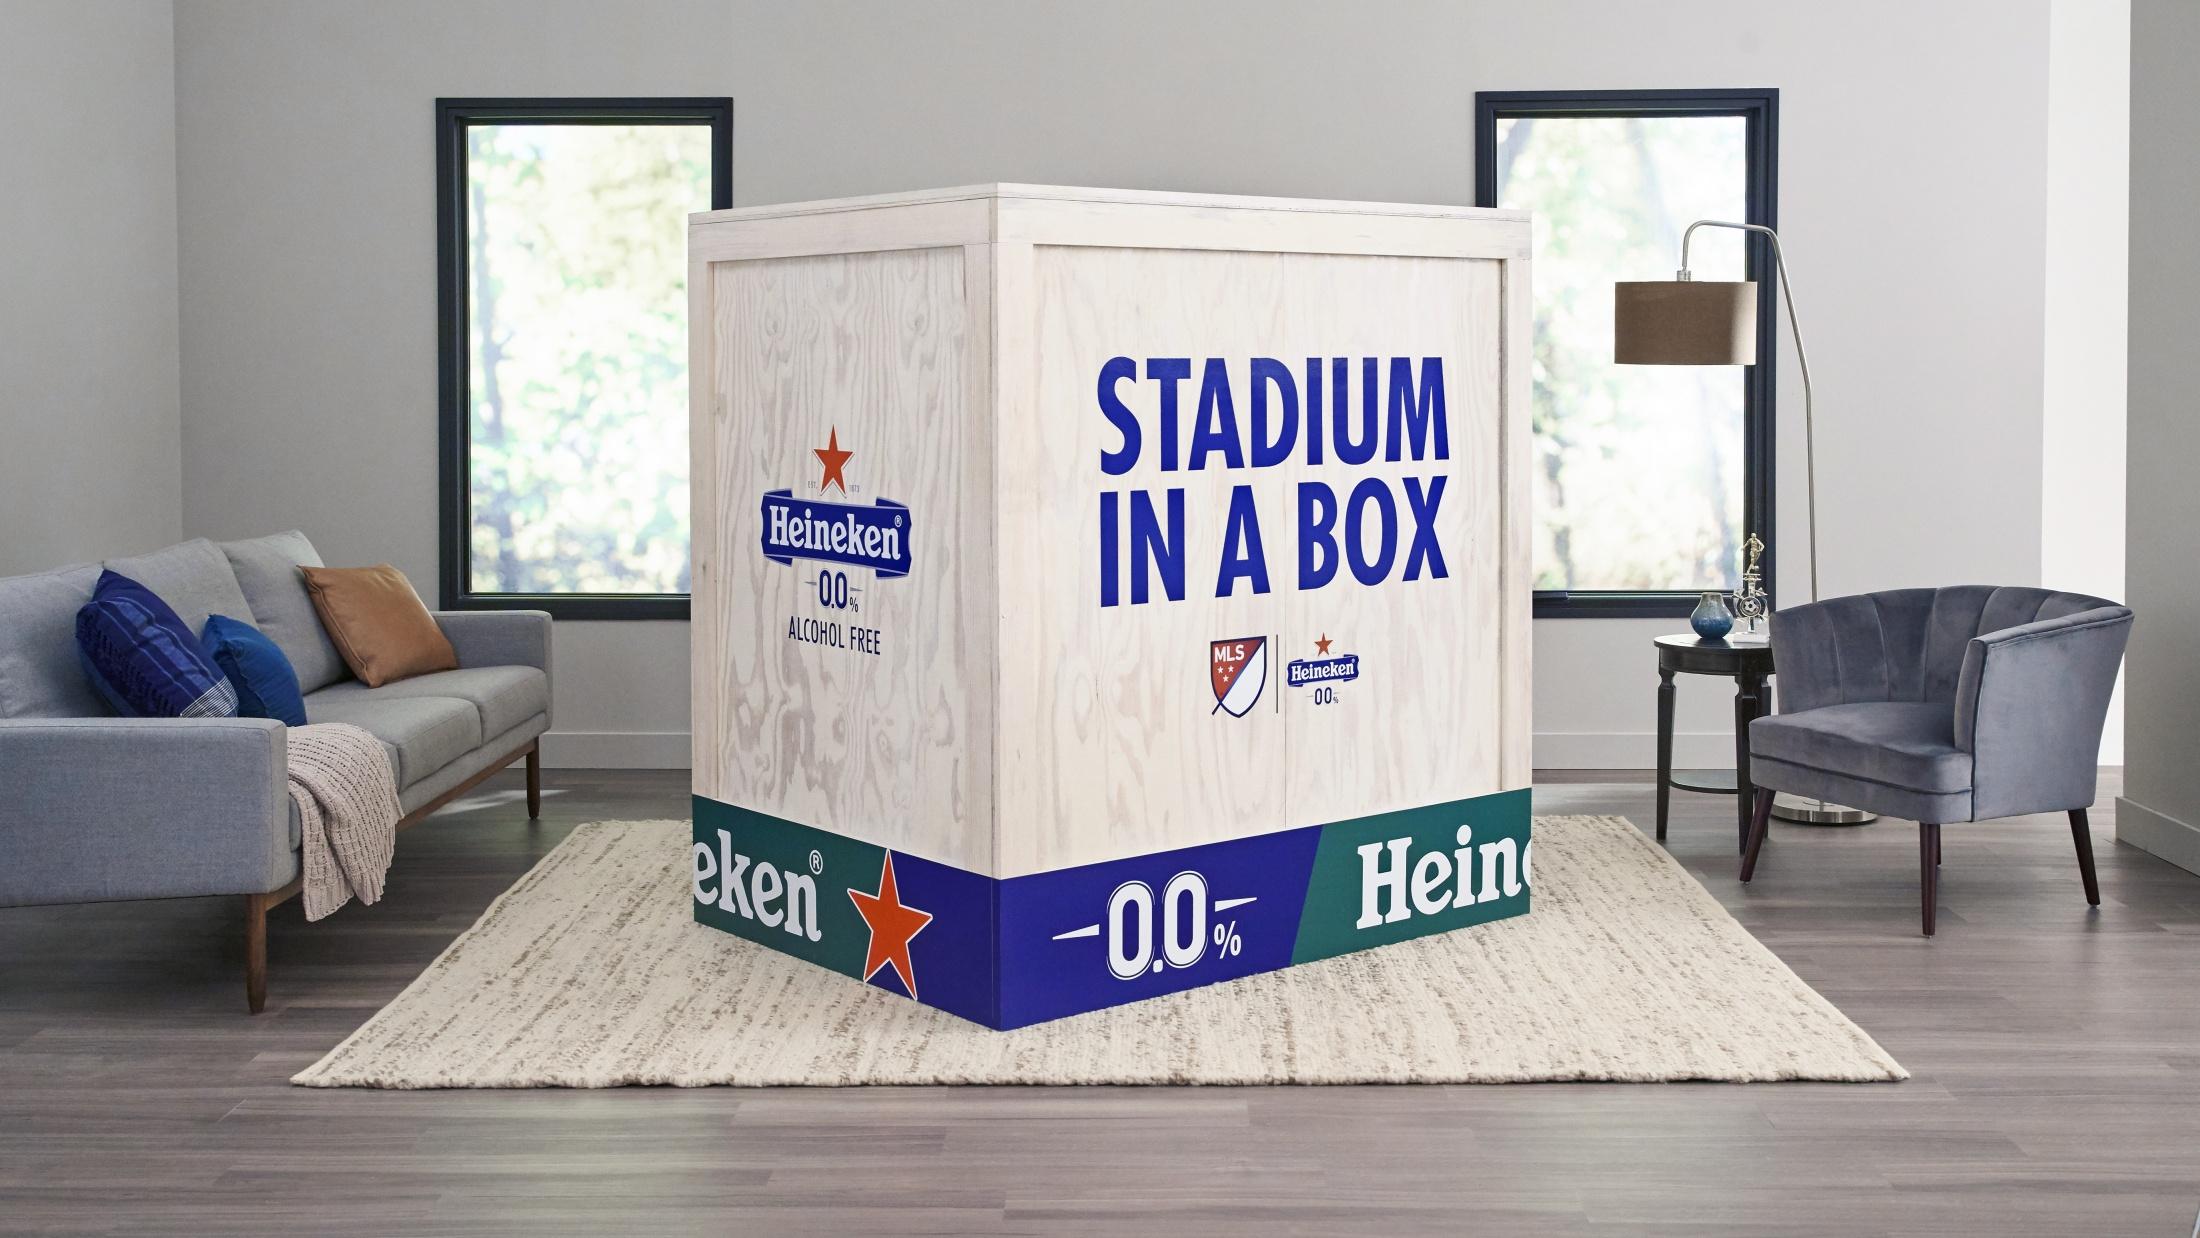 Thumbnail for Heineken 0.0 'Stadium in a Box'